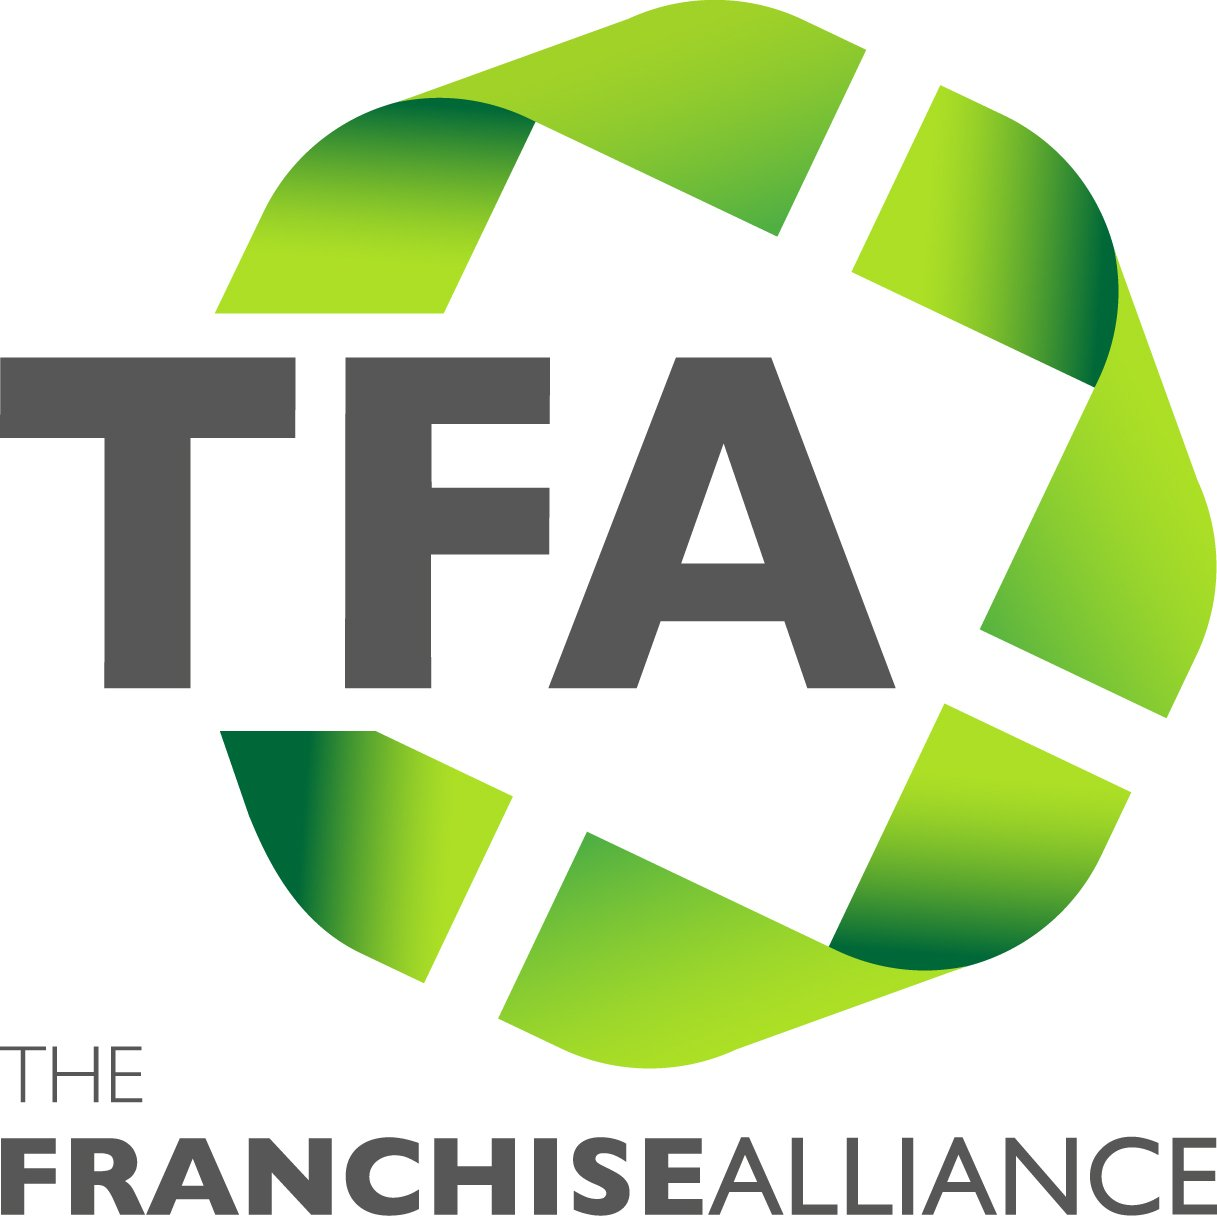 The Franchise Alliance